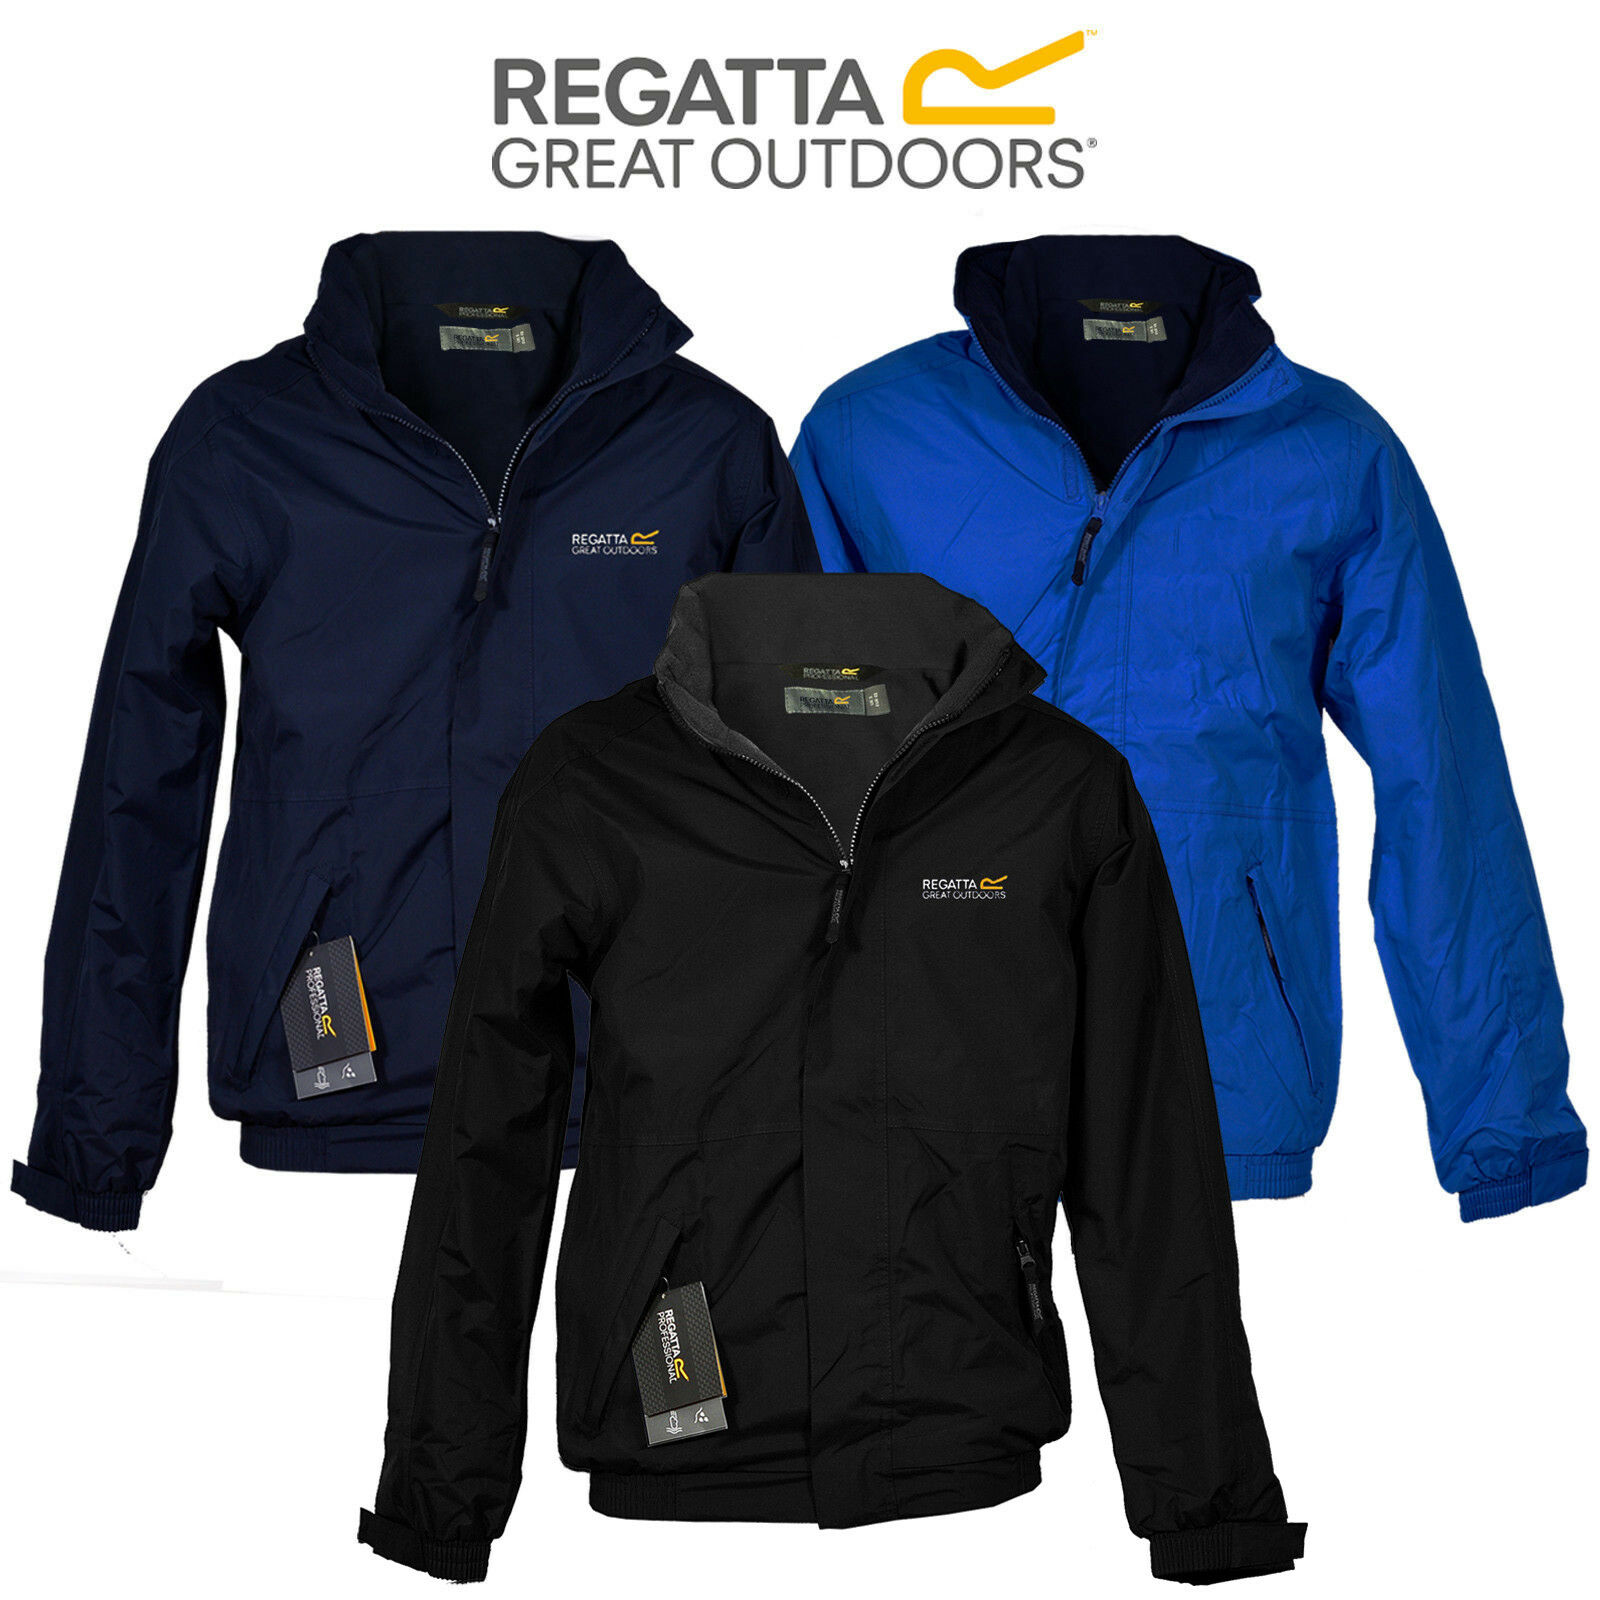 regatta great outdoors coat